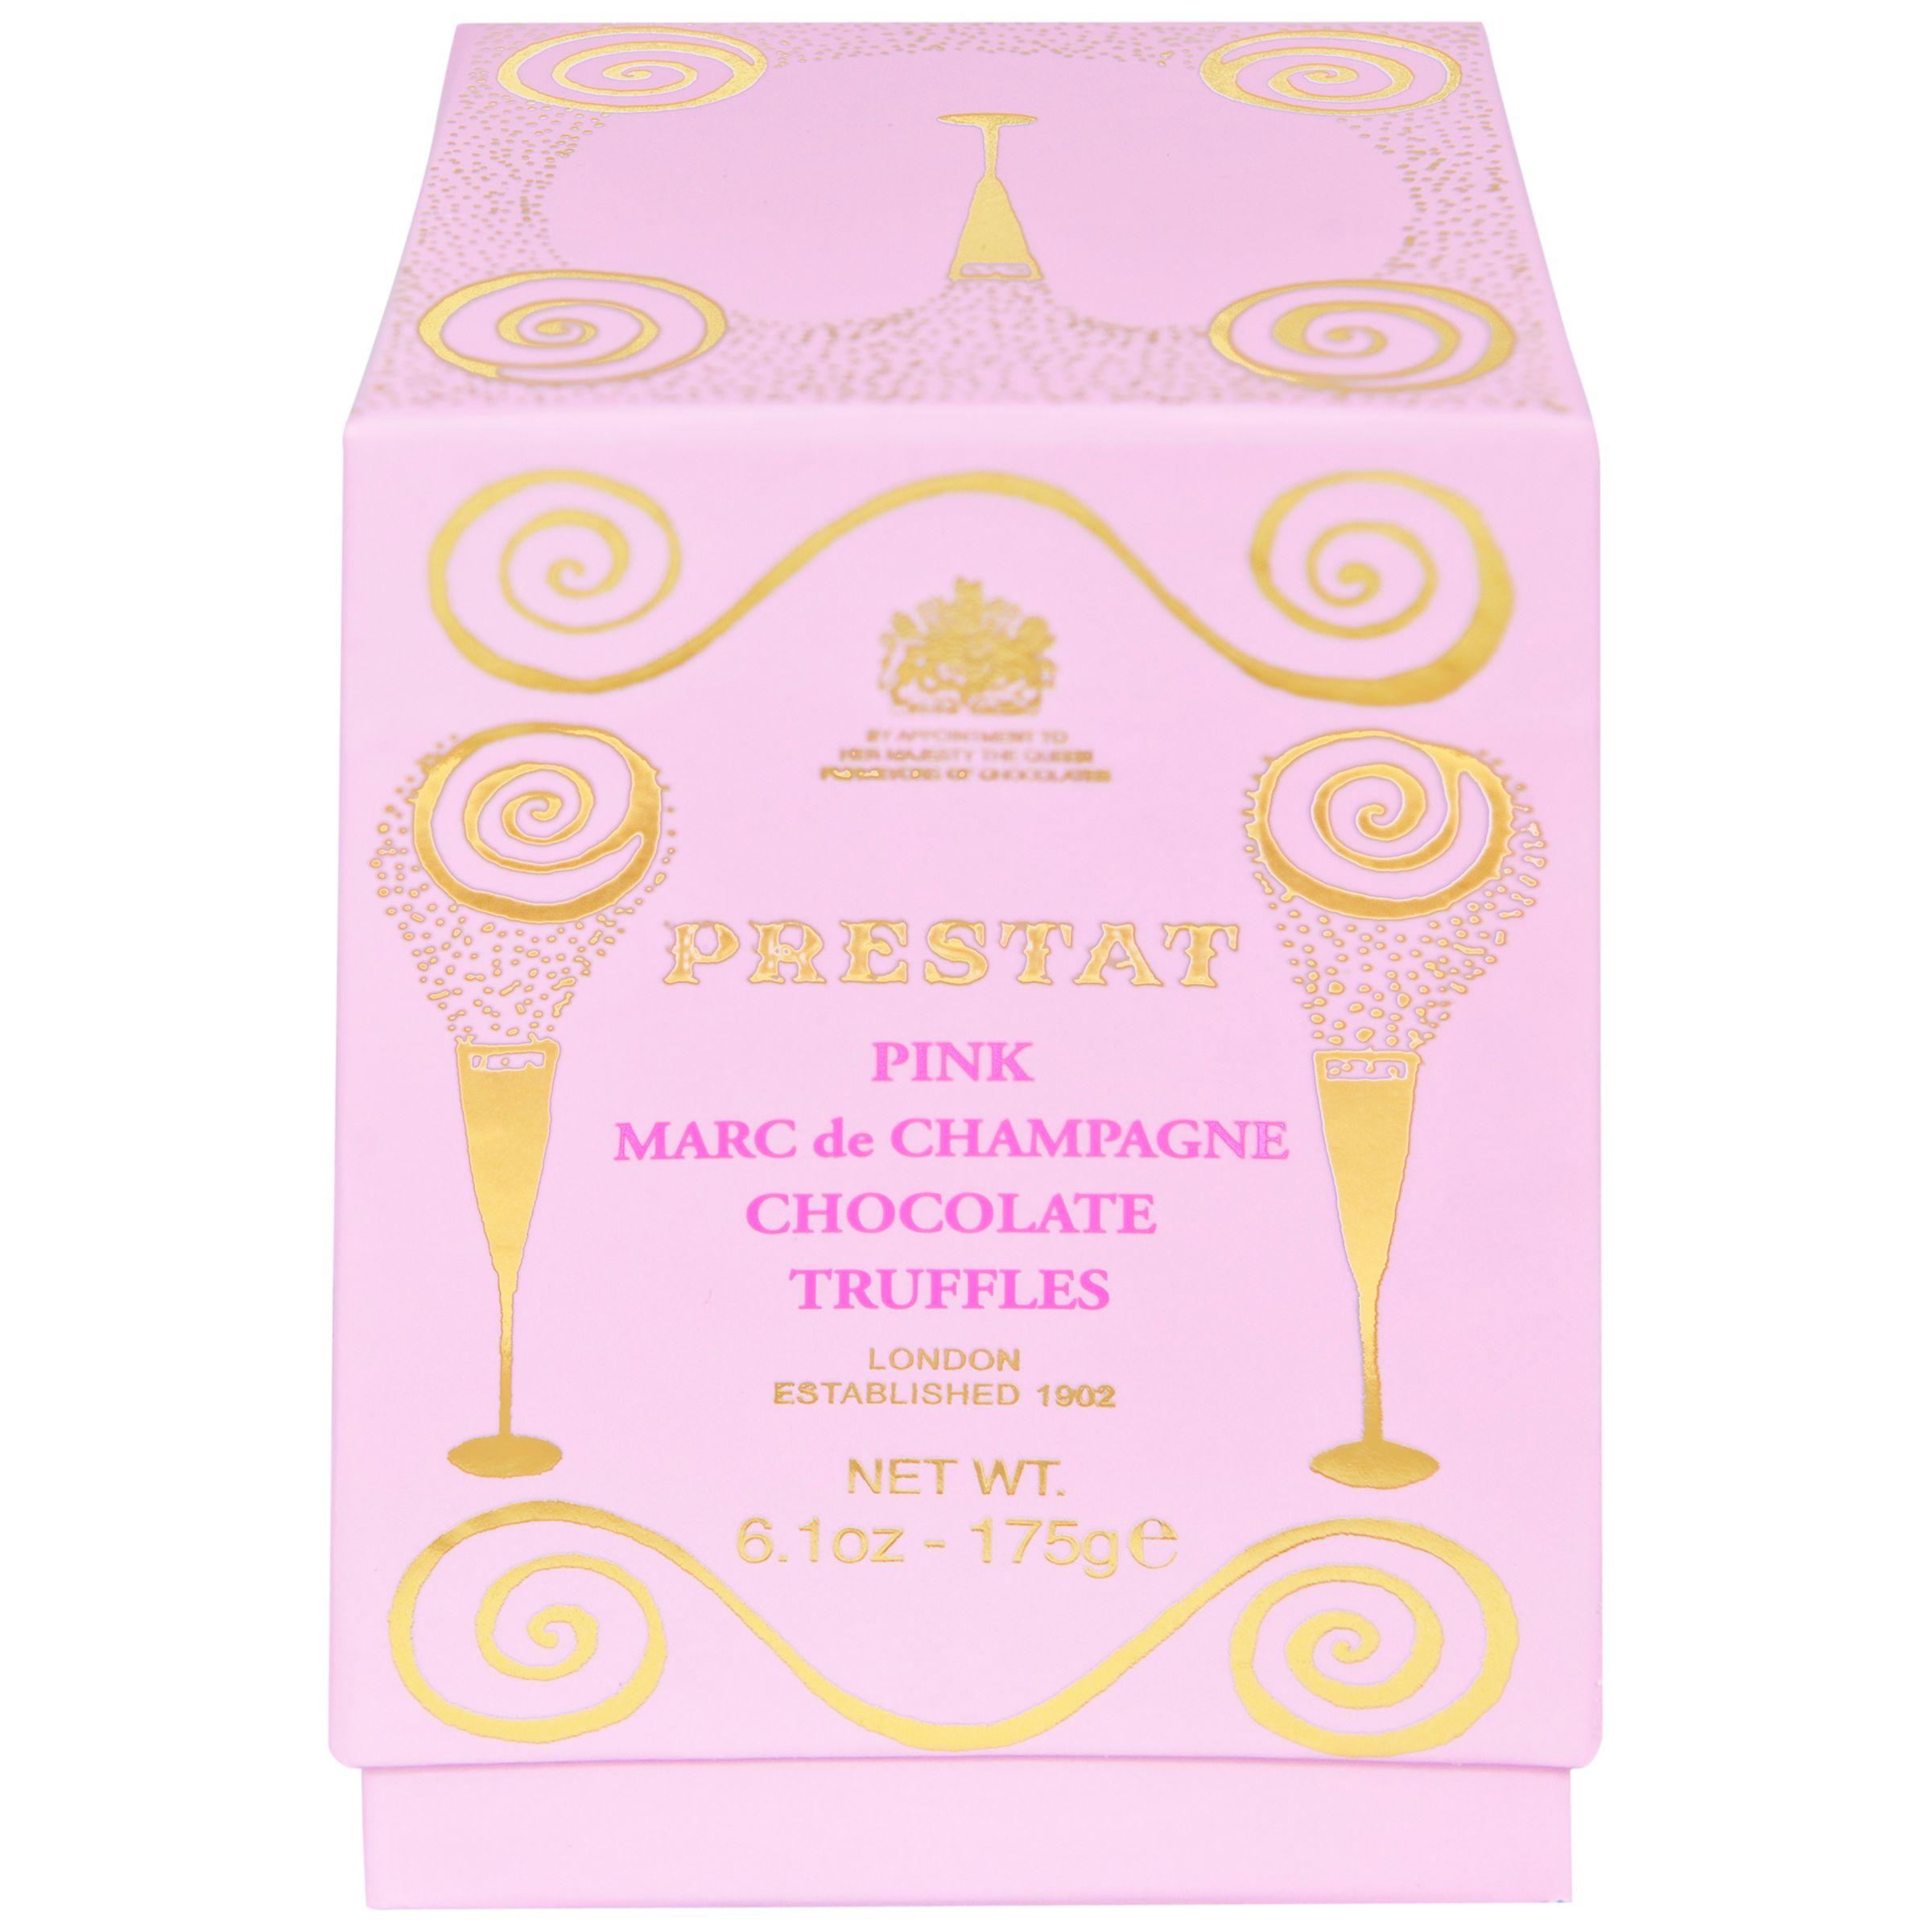 Prestat Prestat Marc de Champagne Pink Chocolate Truffles, 175g